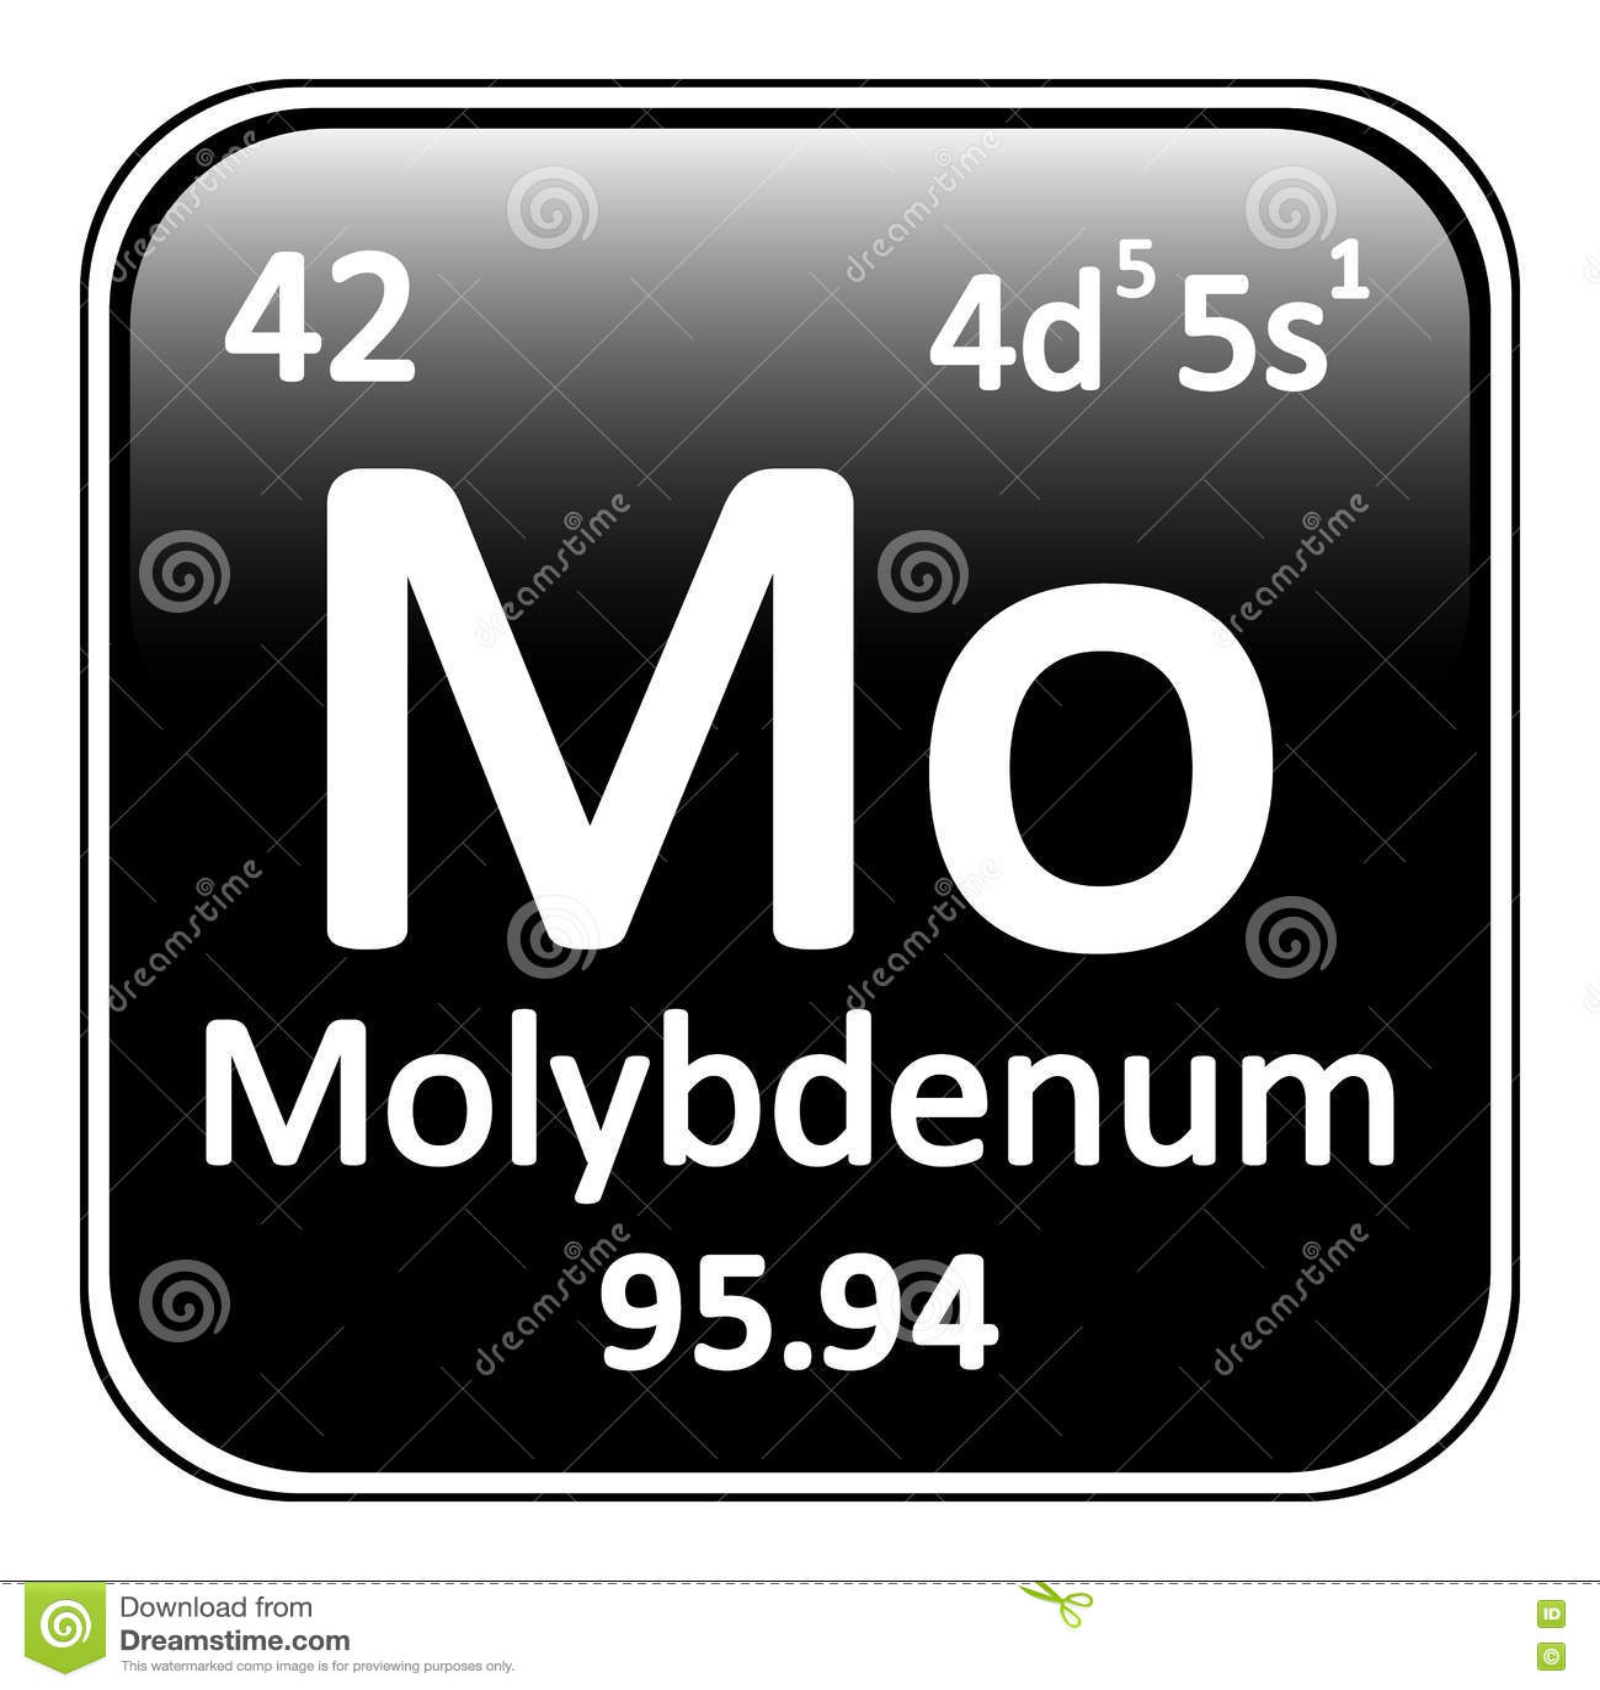 Periodic table element molybdenum icon stock illustration image royalty free illustration download periodic table element molybdenum gamestrikefo Images